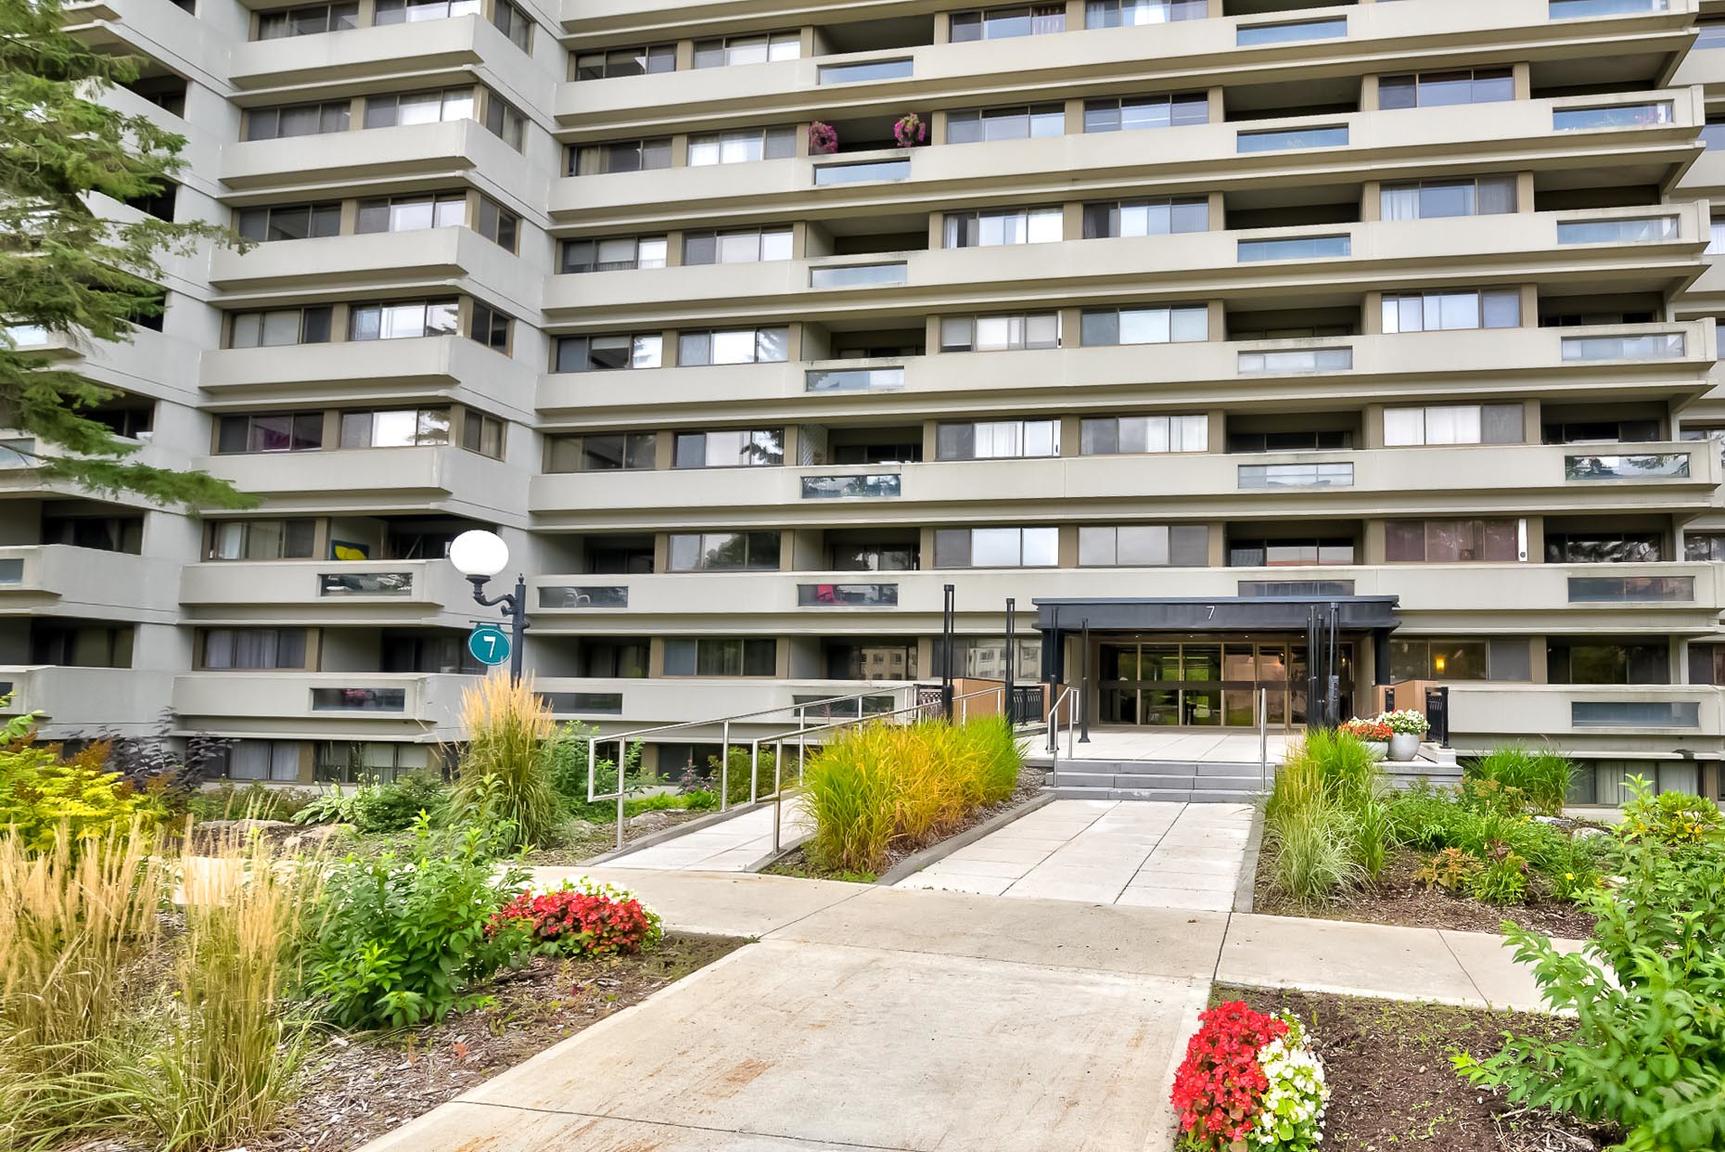 1 bedroom Apartments for rent in Quebec City at Les Jardins de Merici - Photo 33 - RentersPages – L407121